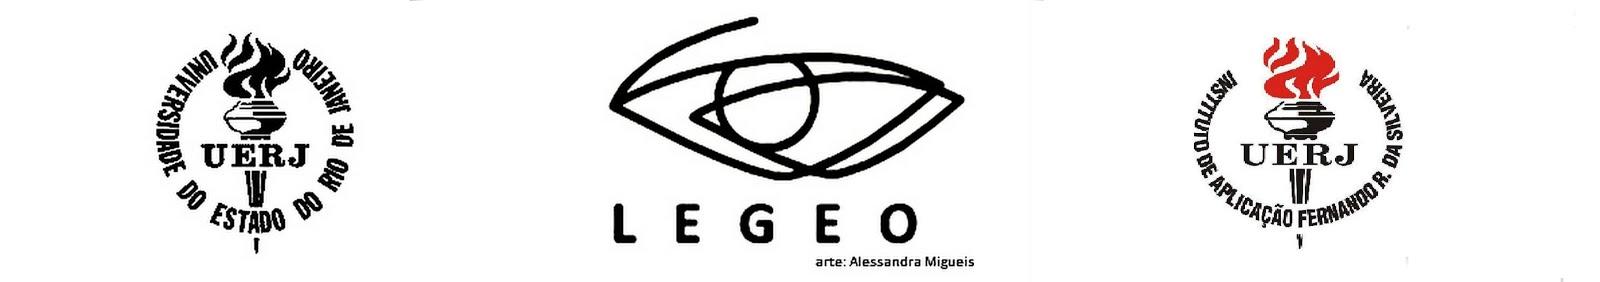 LEGEO CAp-UERJ